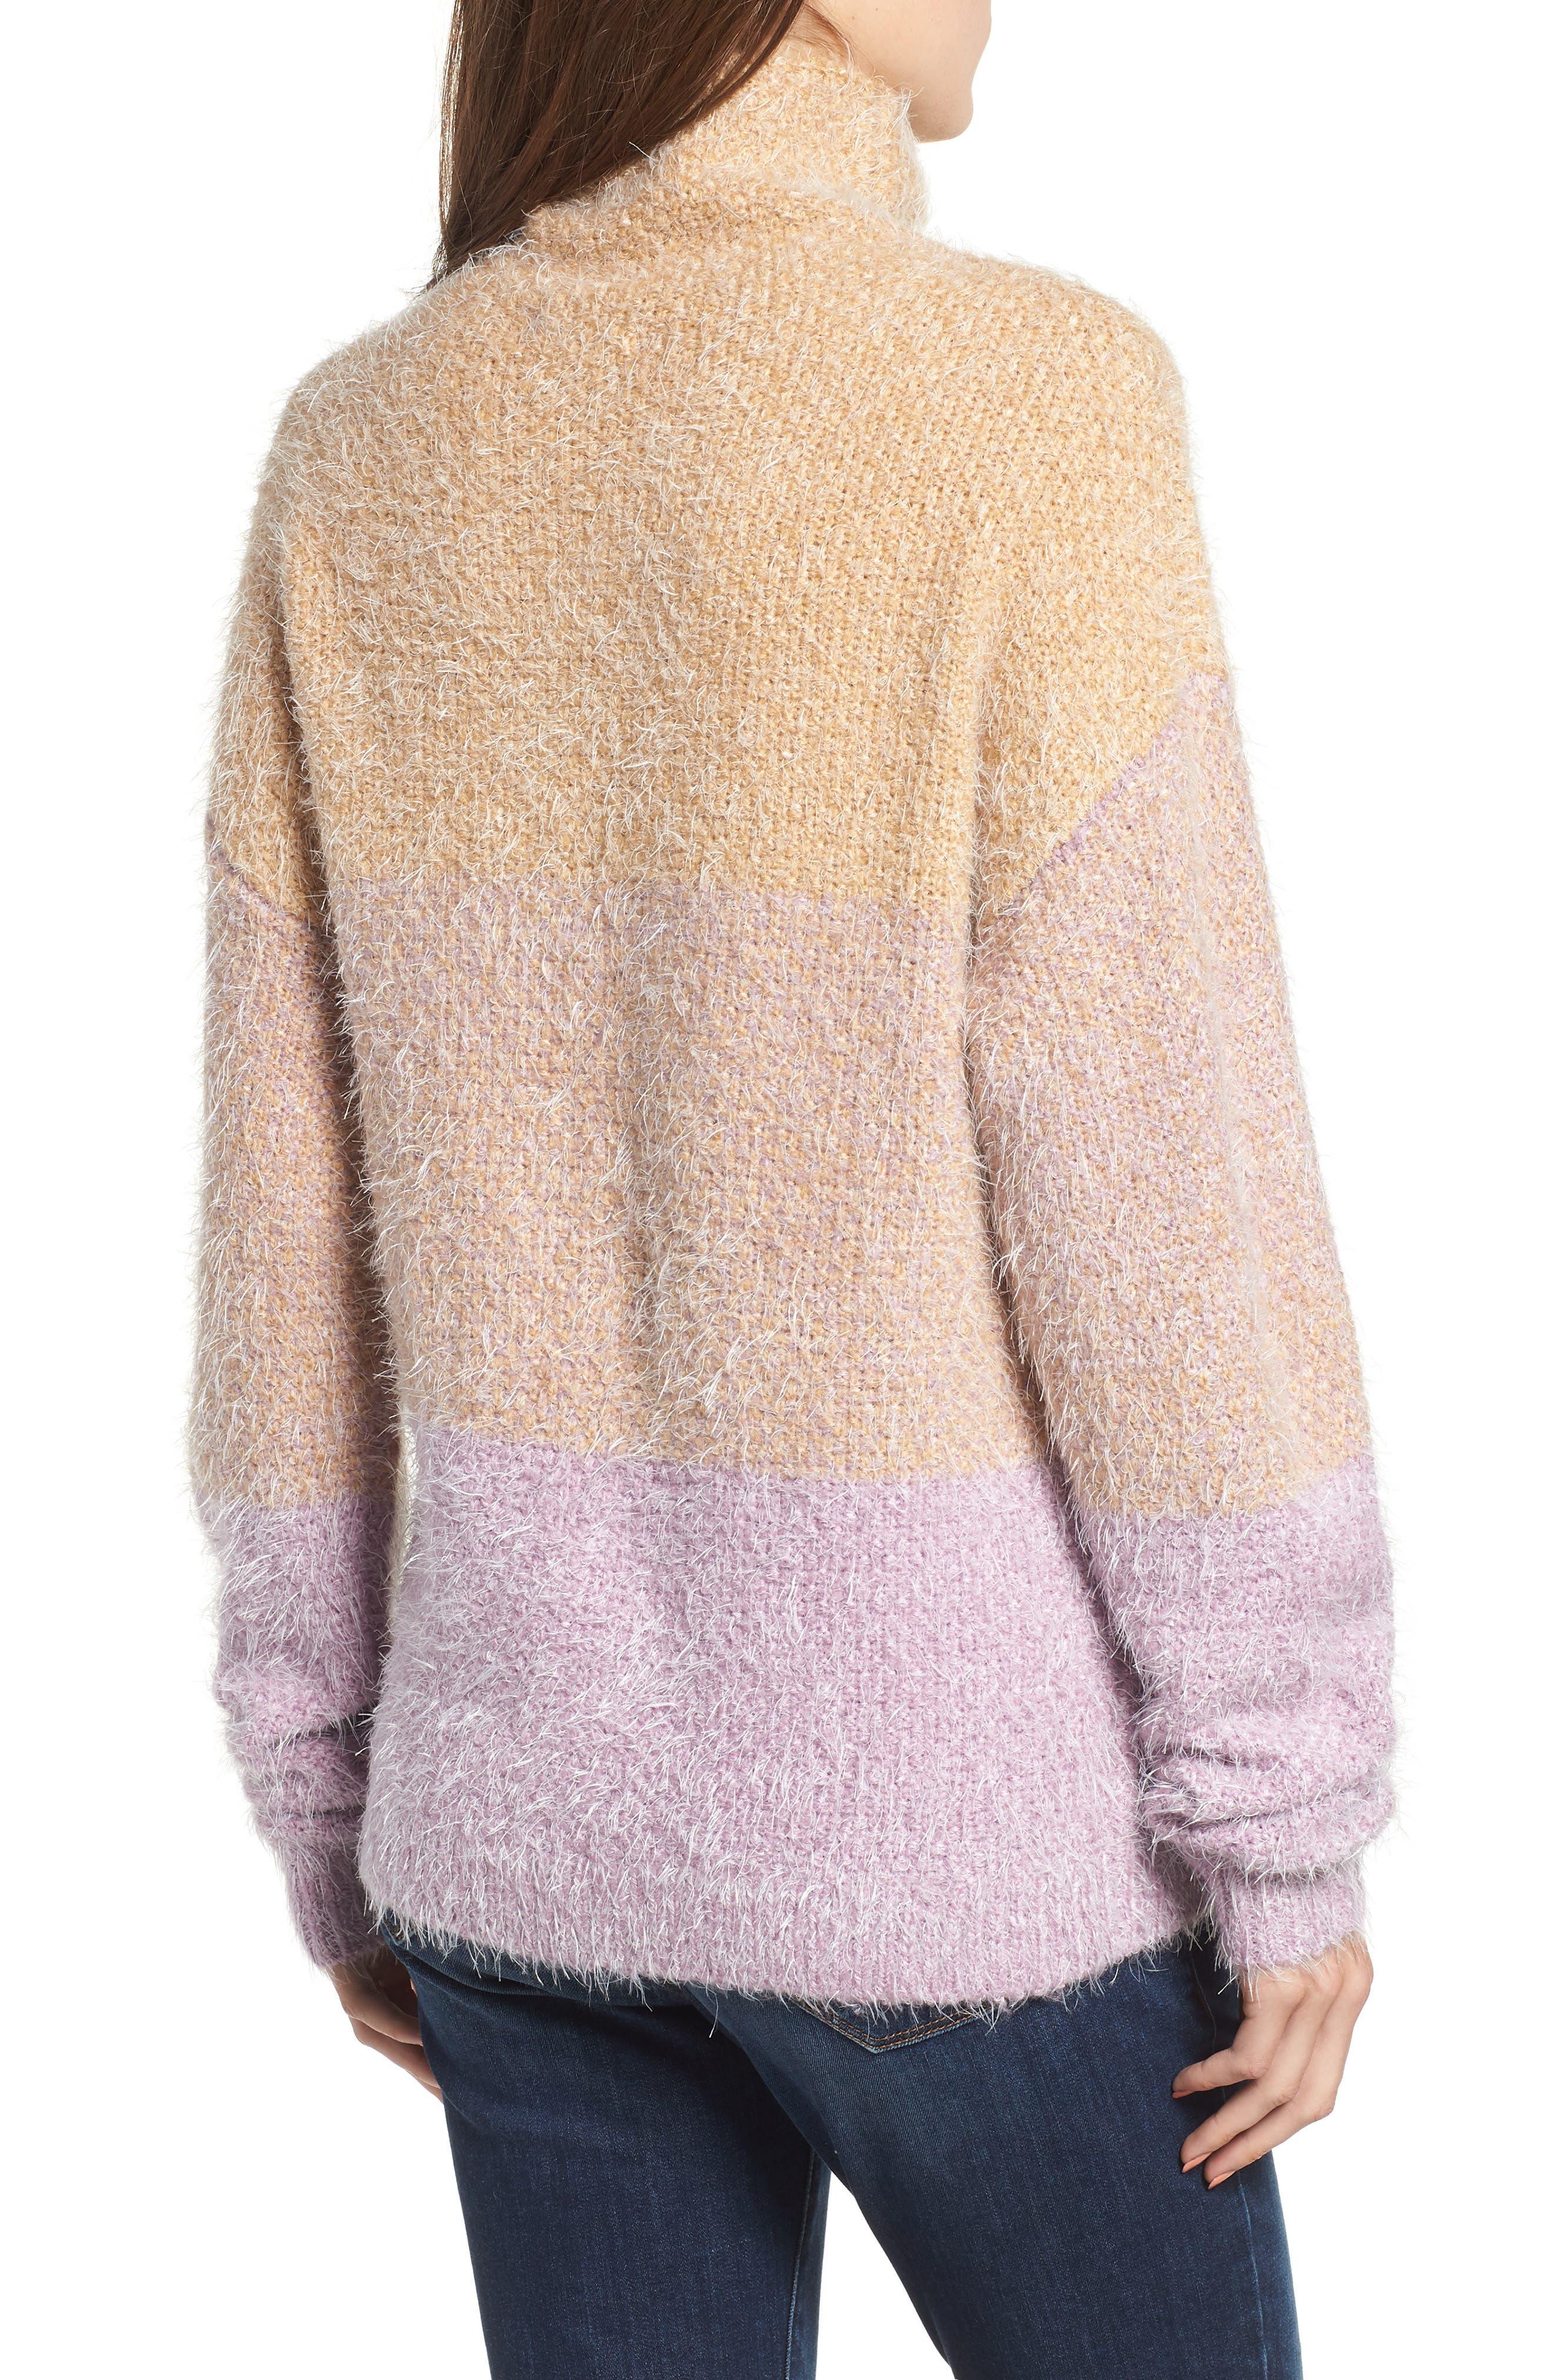 BP., Ombré Eyelash Sweater, Alternate thumbnail 2, color, 680